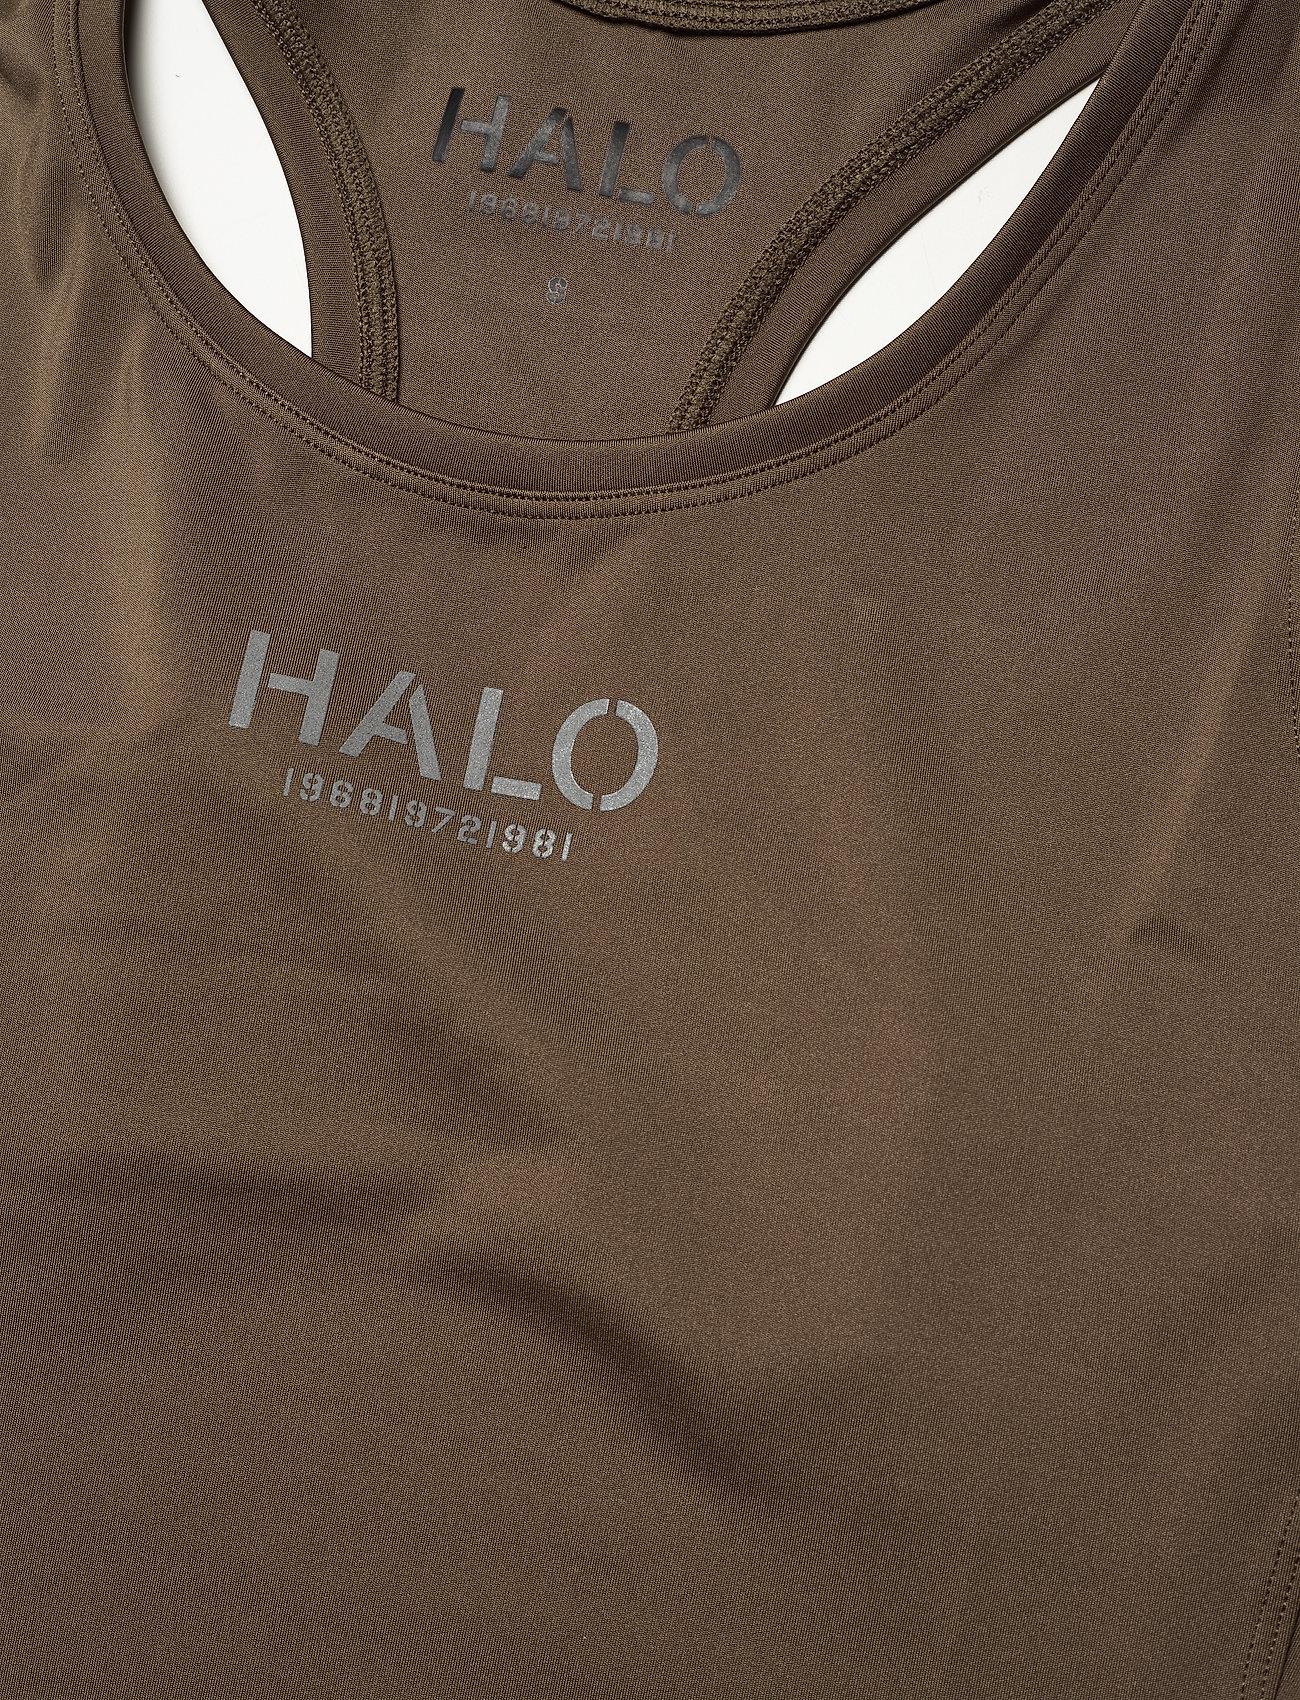 HALO - HALO WOMENS RACERBACK TANK - sleeveless tops - vintage brown - 2